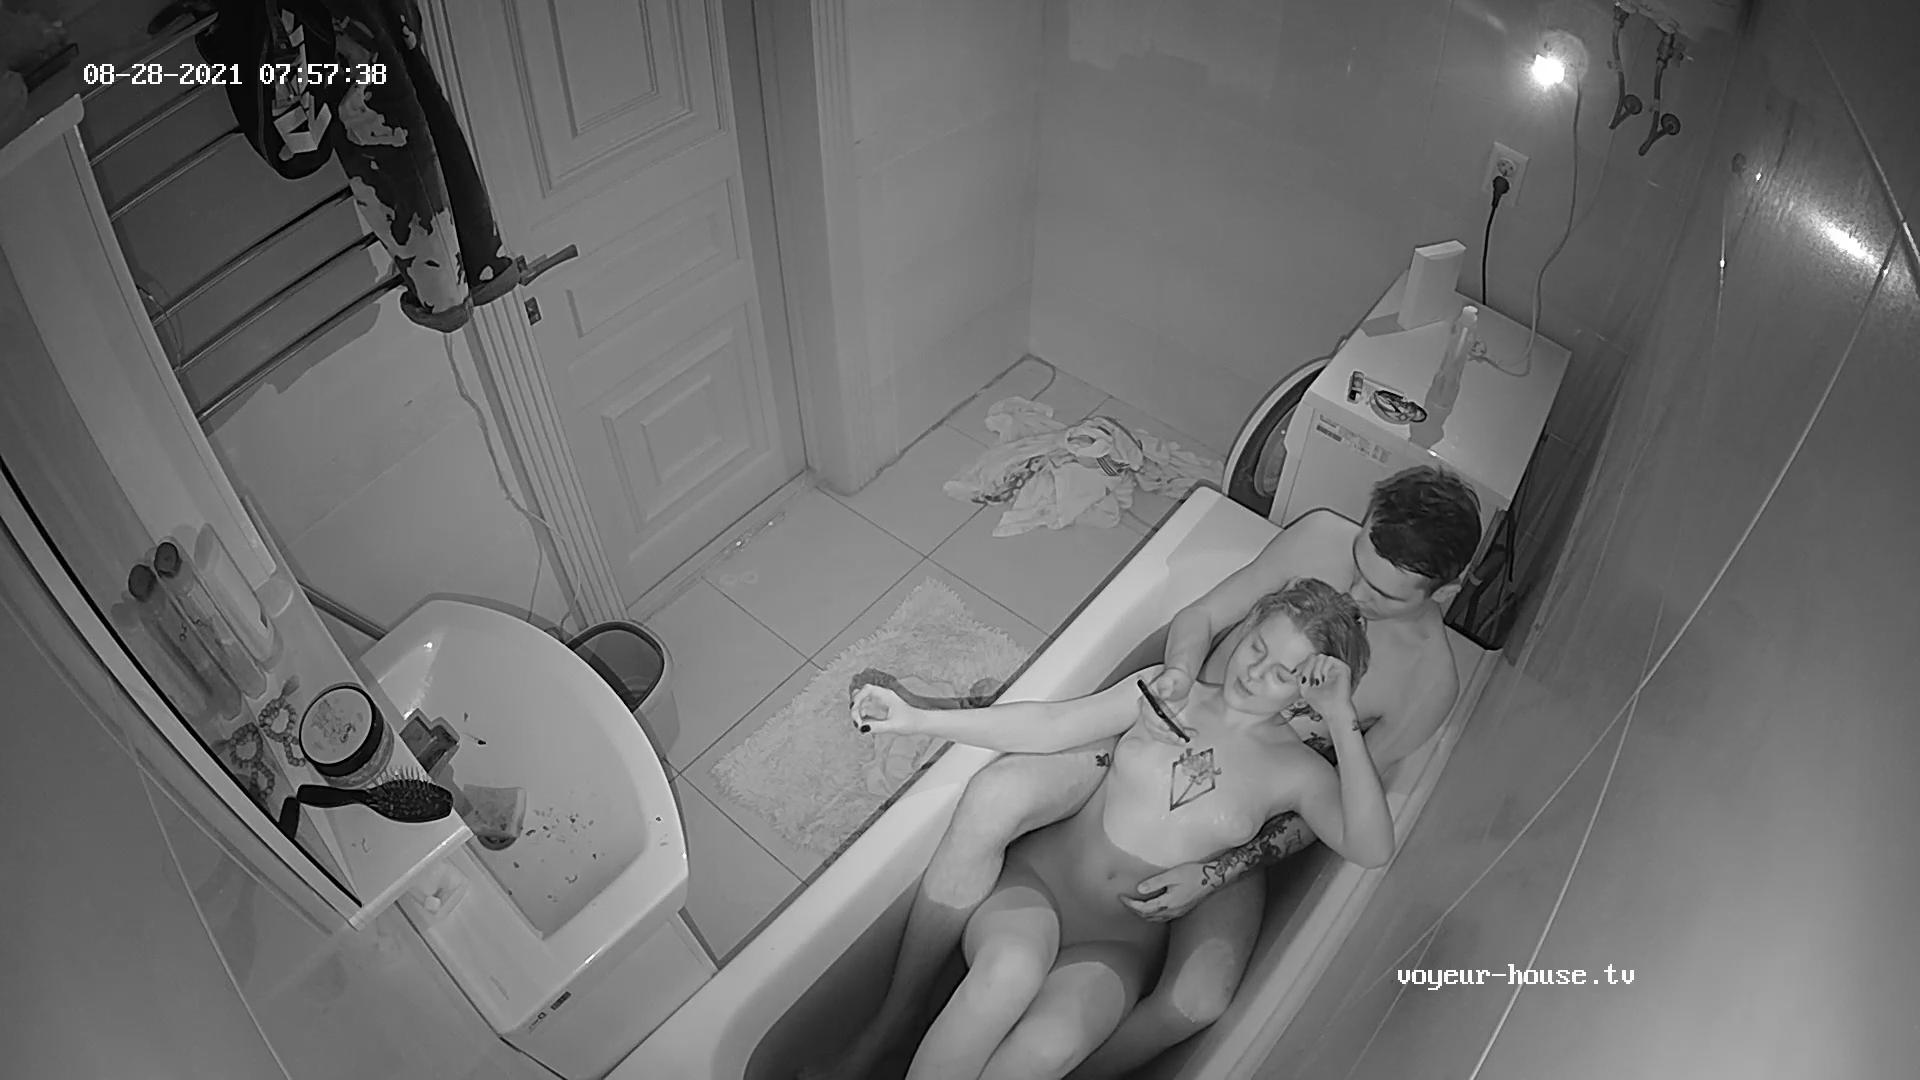 Artem Siora bath together 28 Aug 2021